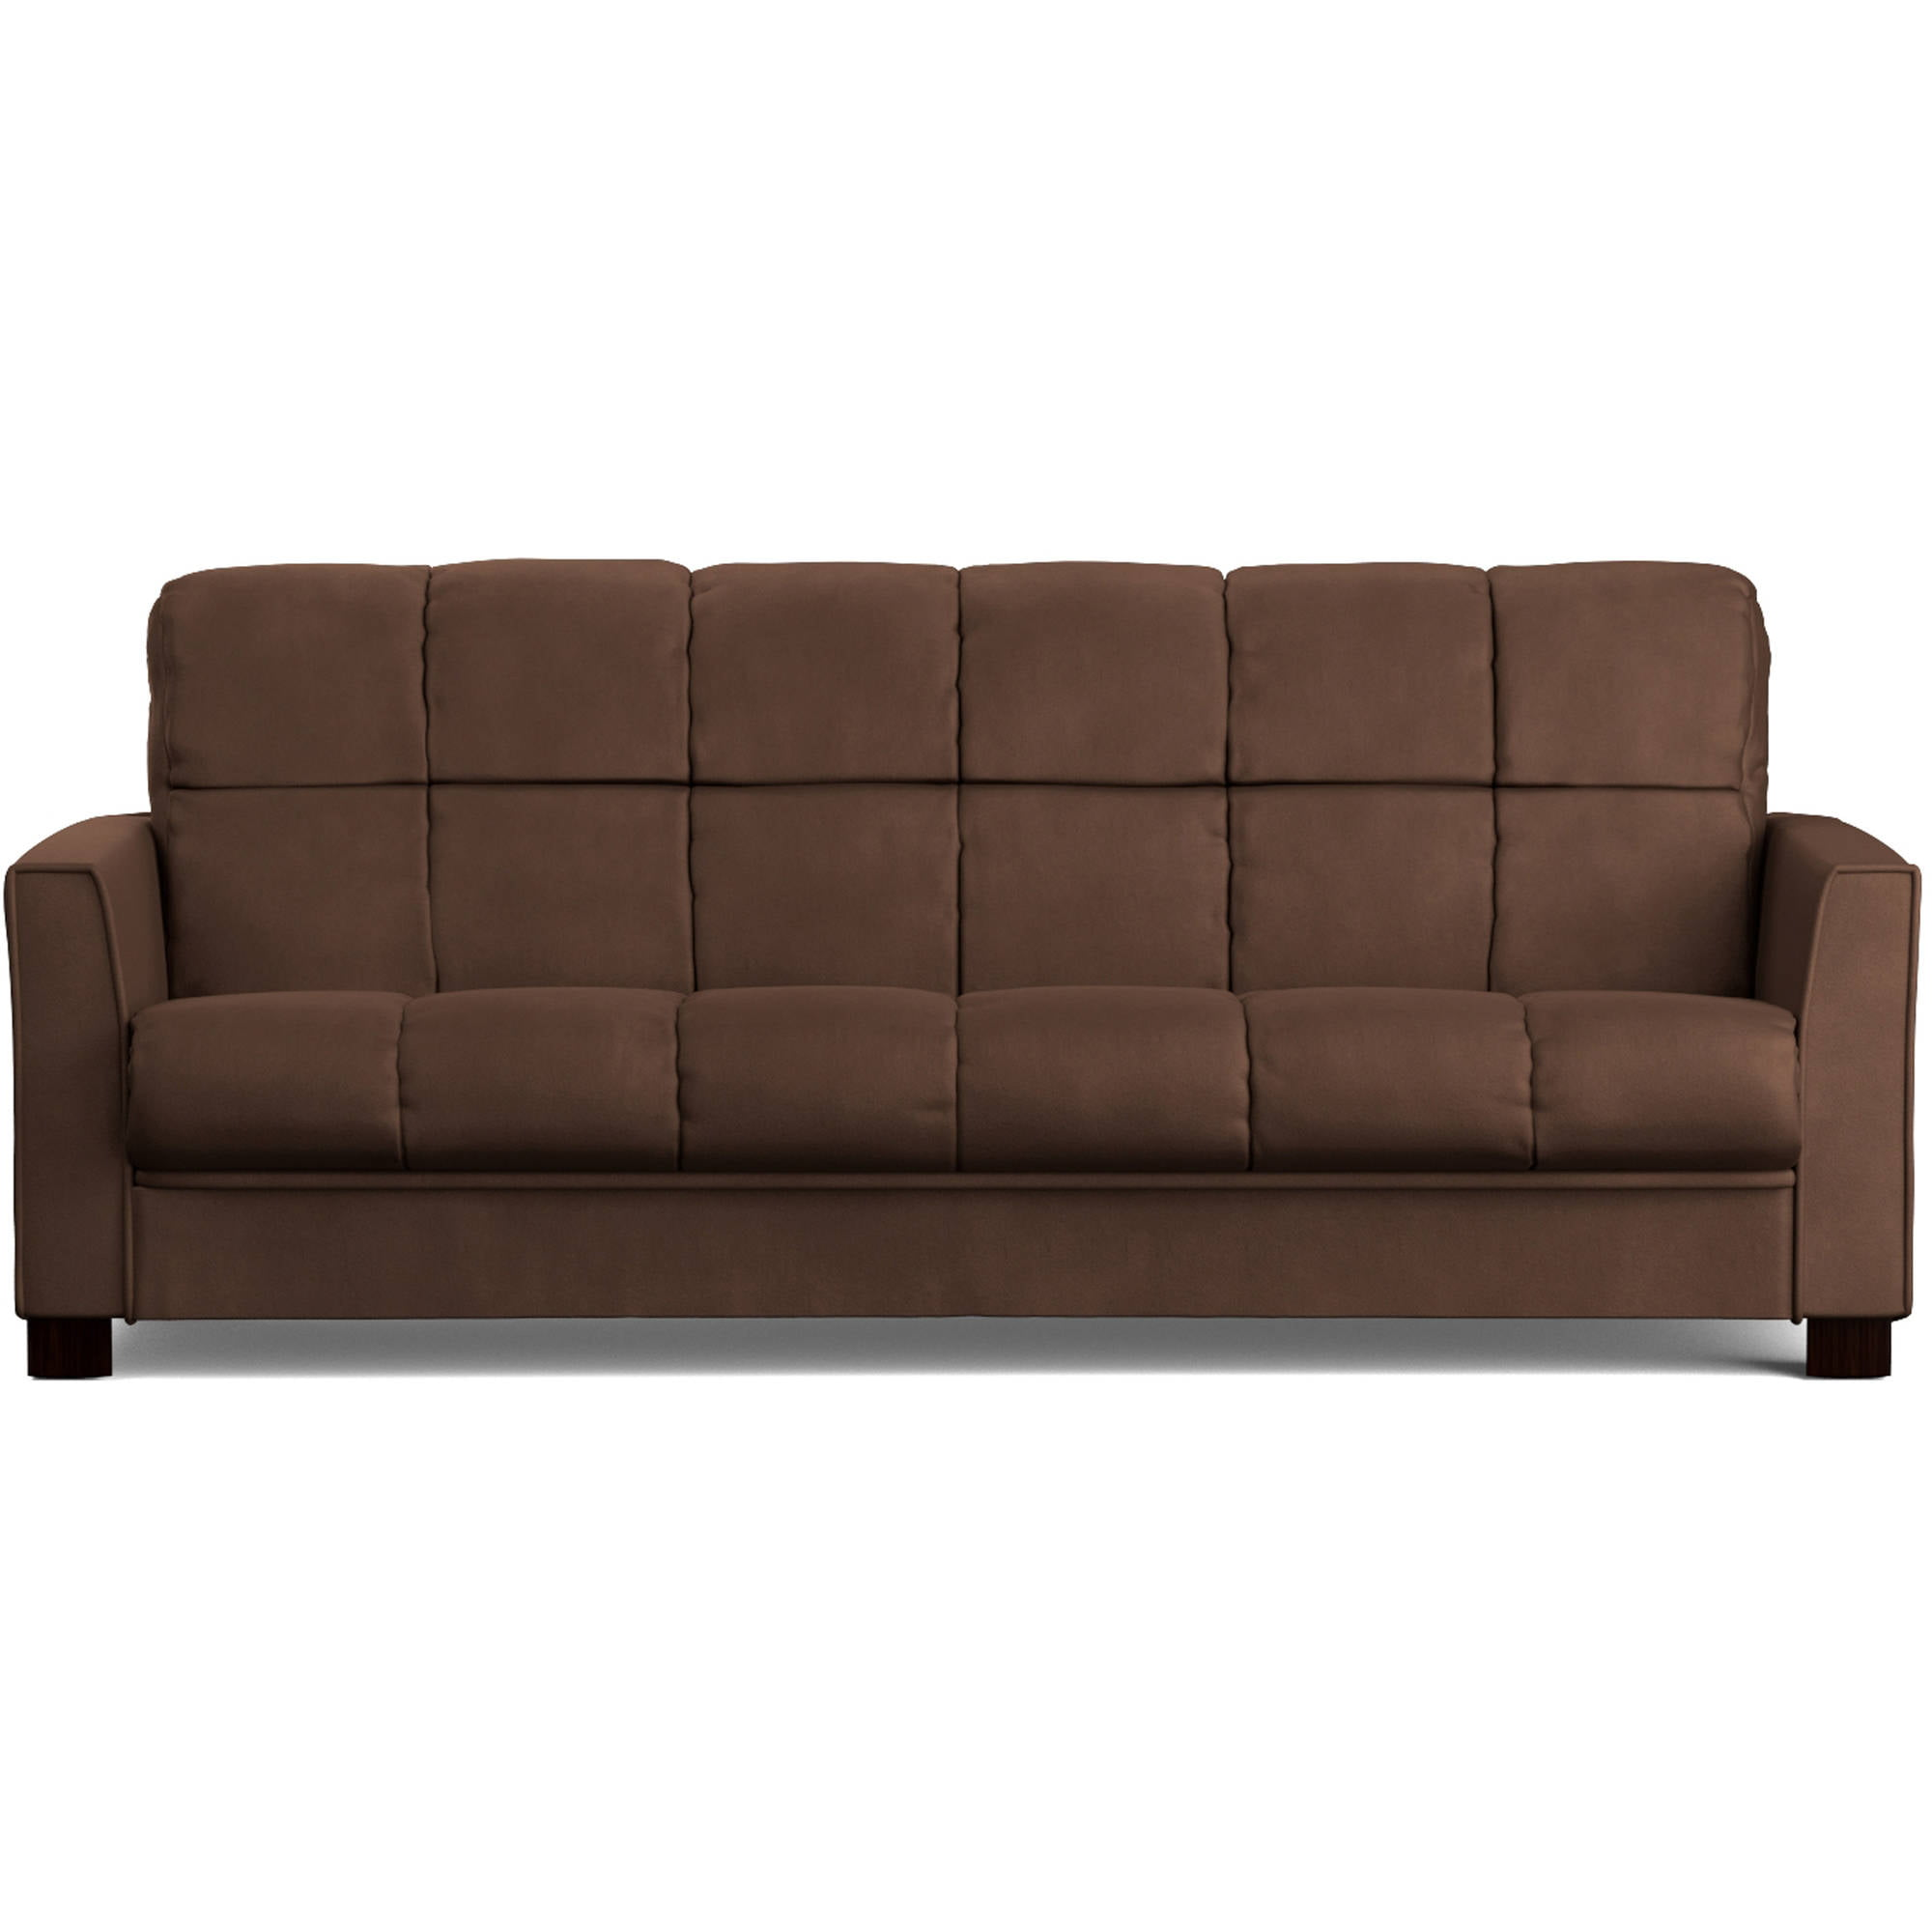 Futon Sofa Sleeper